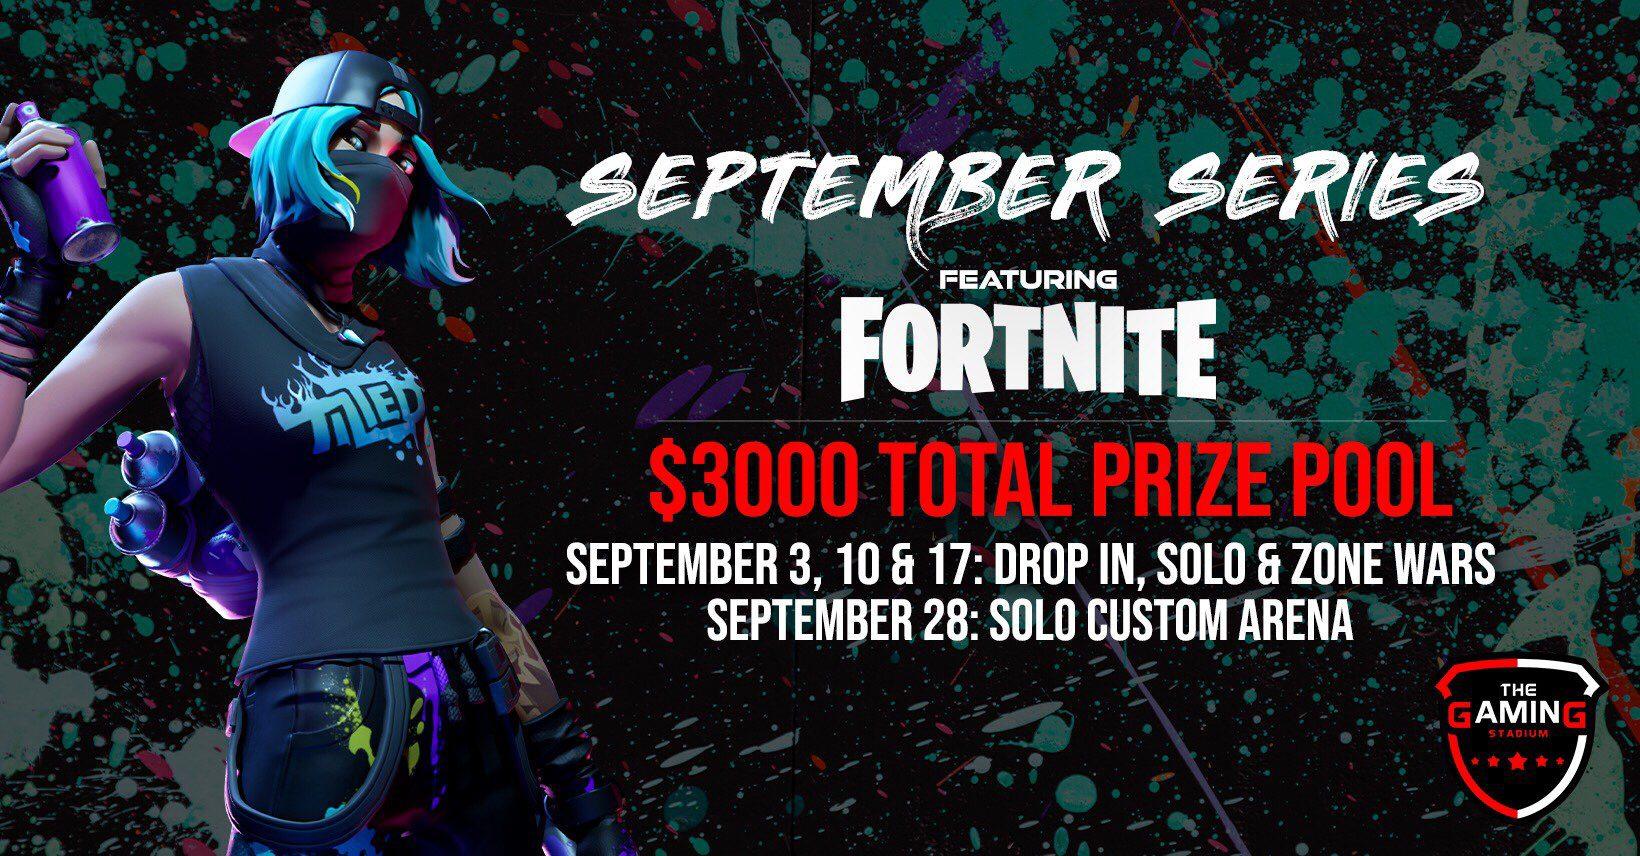 September Series Featuring Fortnite Gaming Stadium